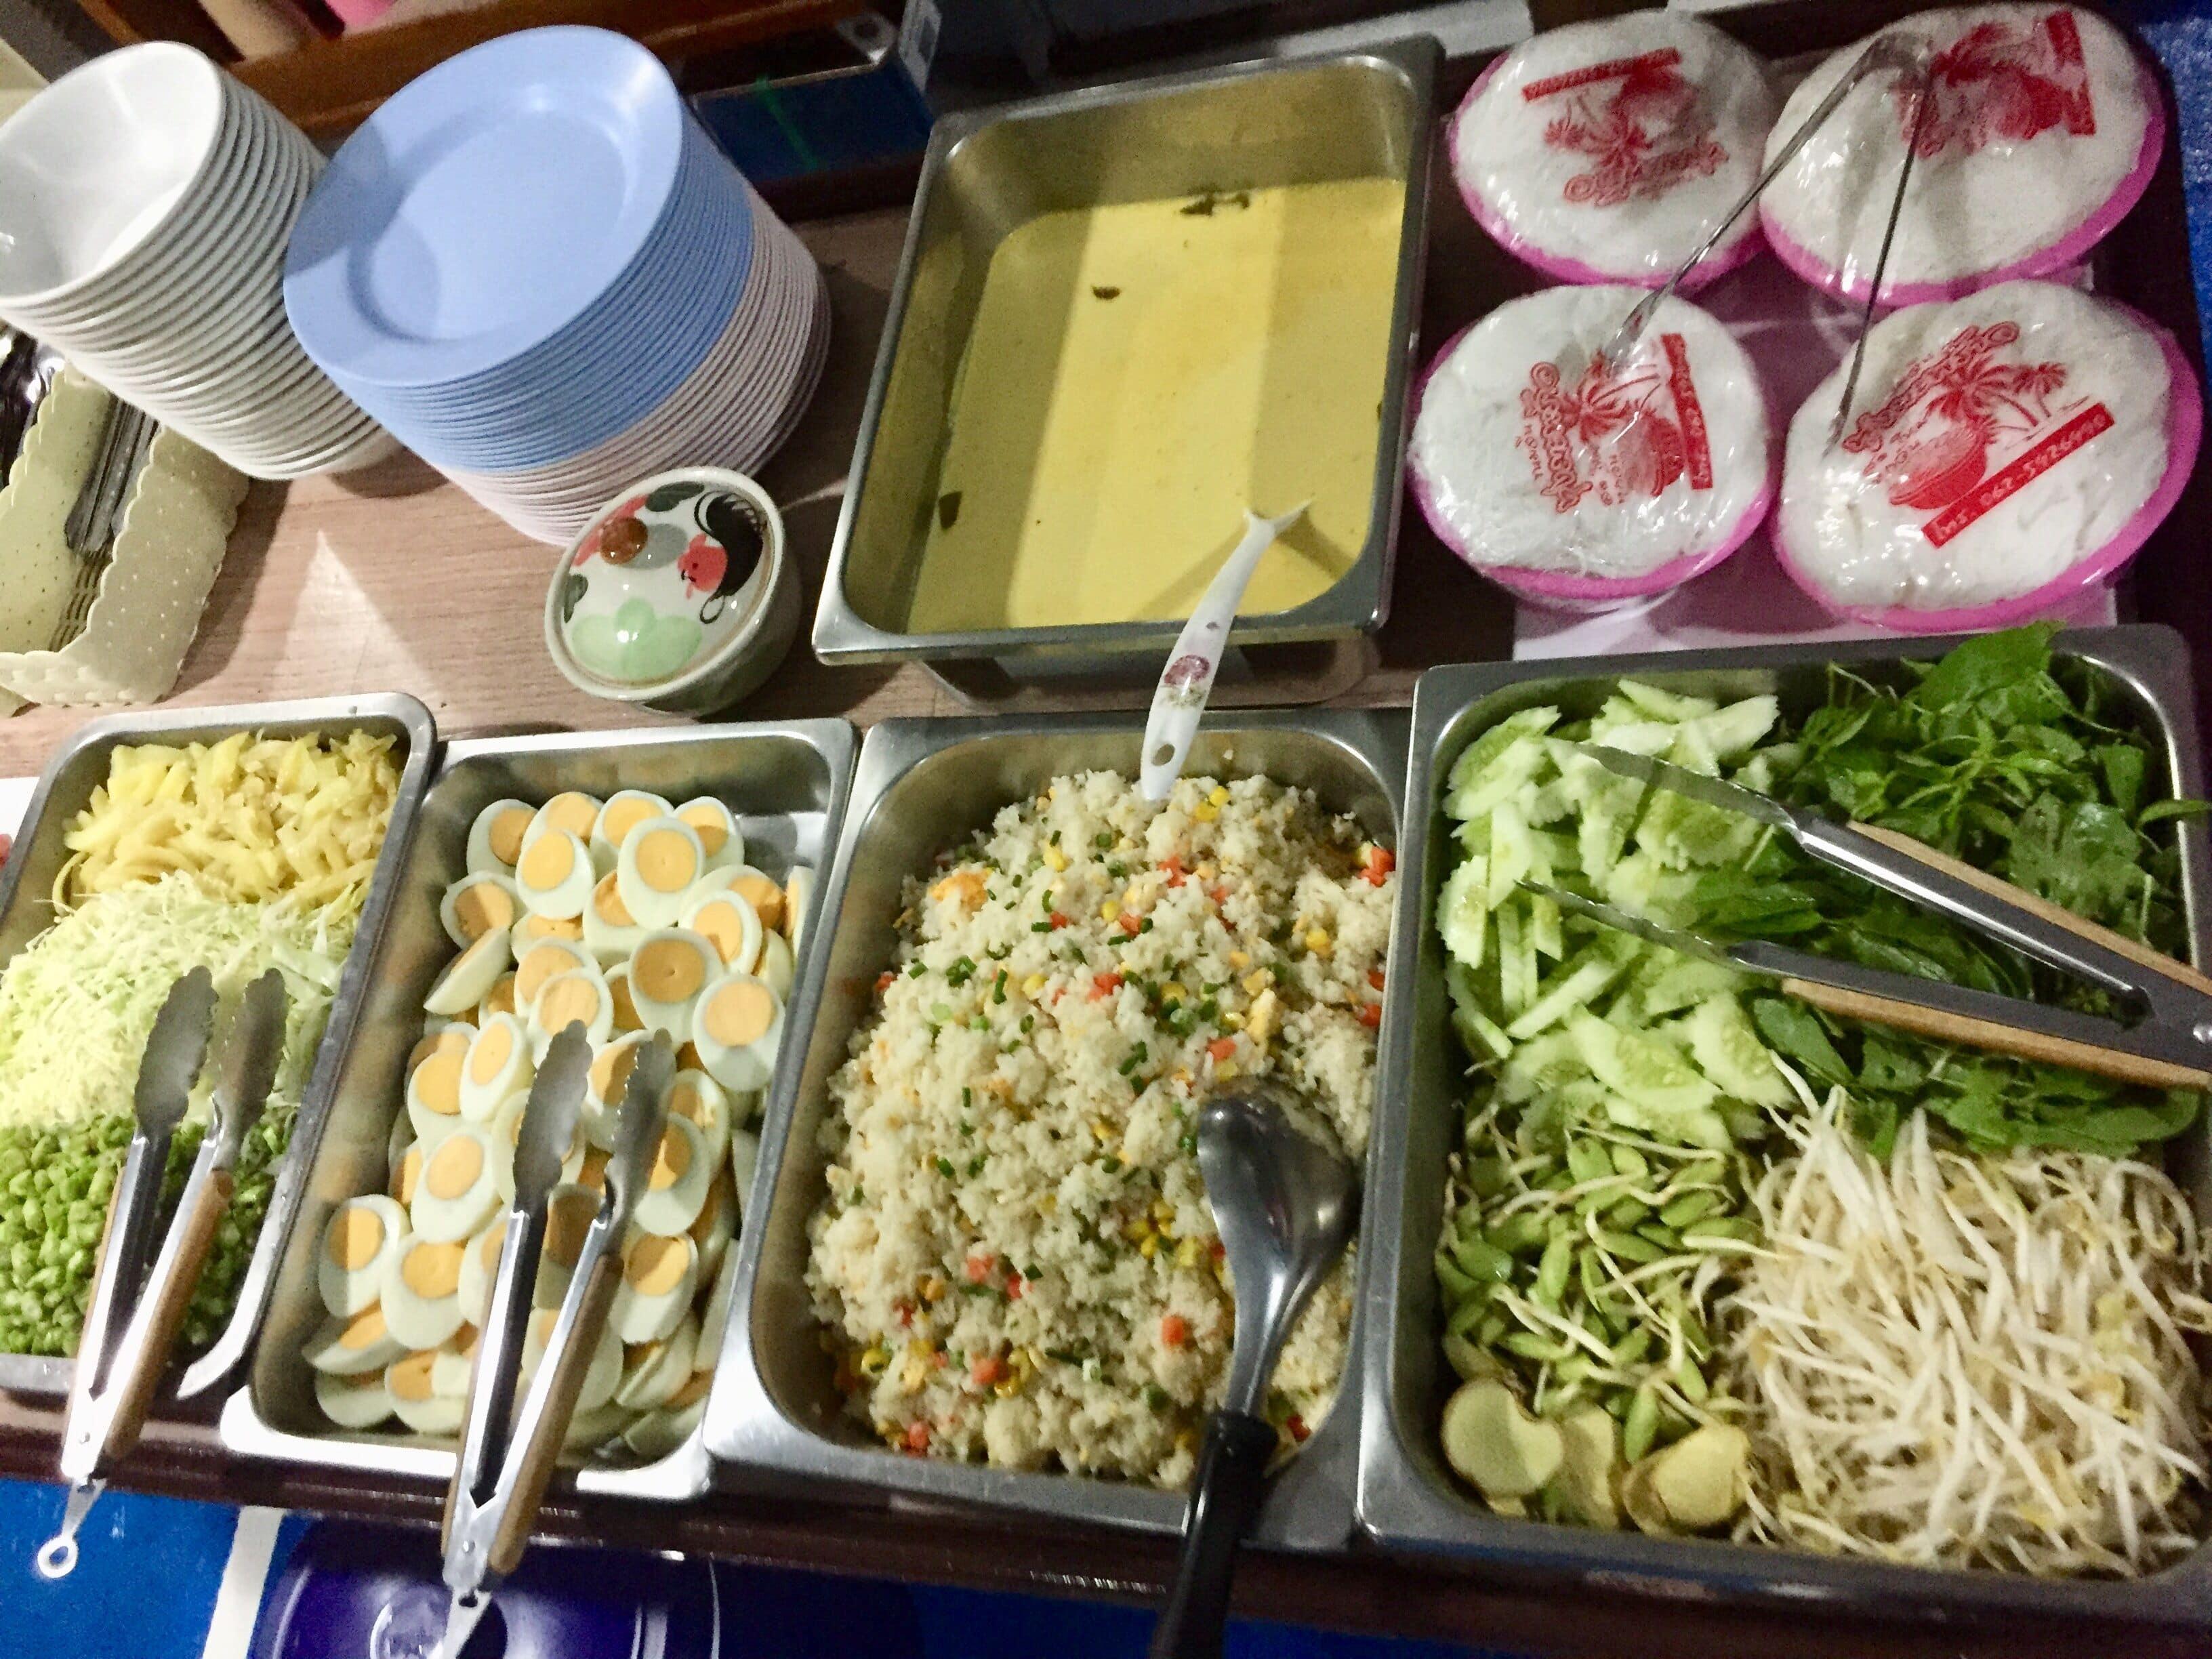 Peterpan food